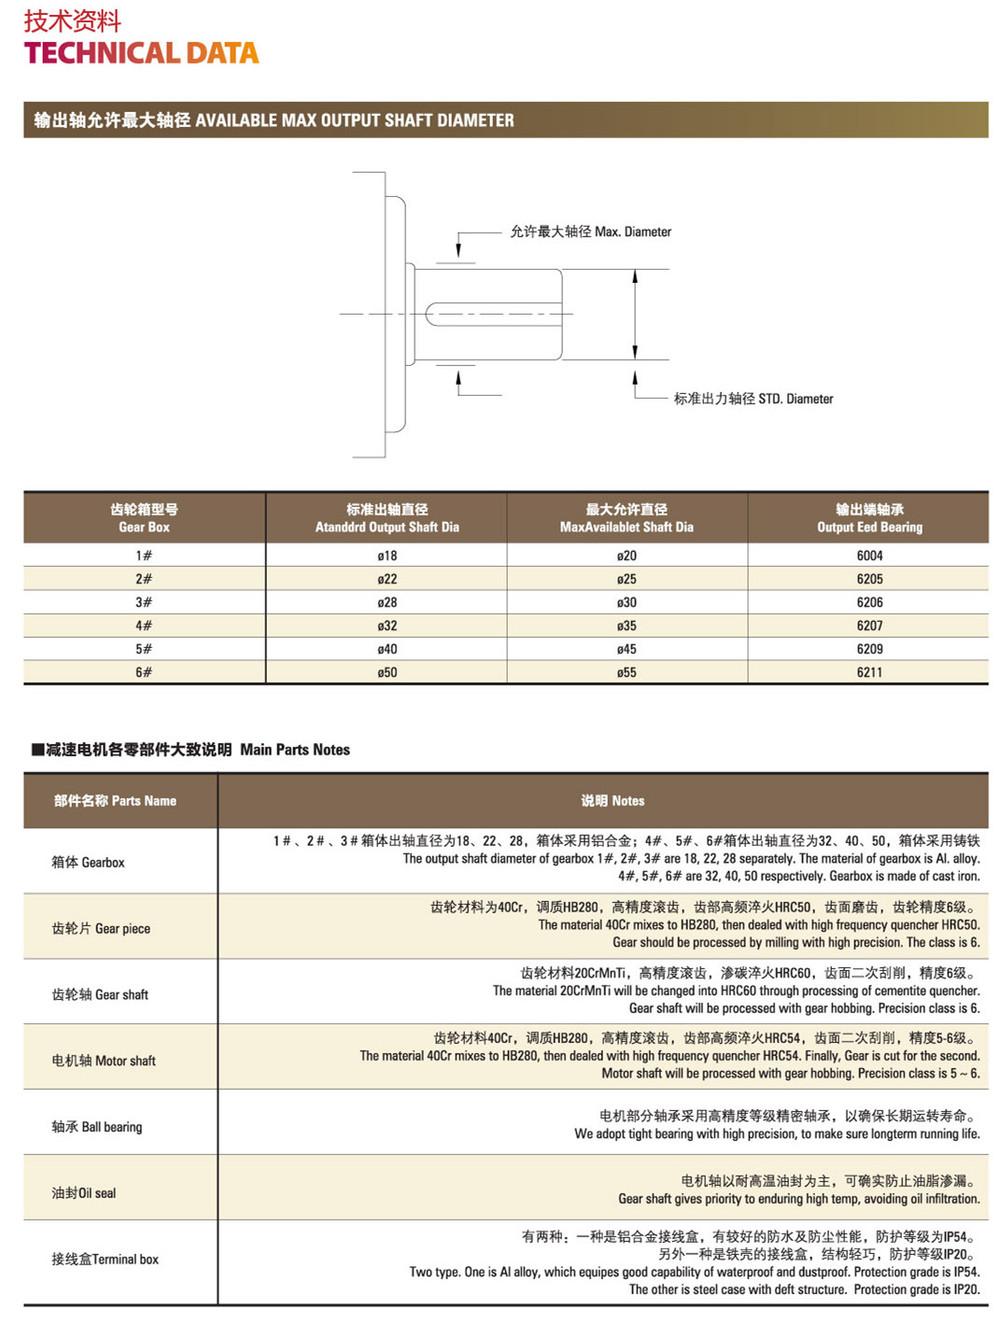 HTB1.1wyHXXXXXaaXXXXq6xXFXXXe - 200W motor with brake voltage 220 volts 1 phase shaft diameter 22mm output speed 90-100 turns reducer for the machine tool